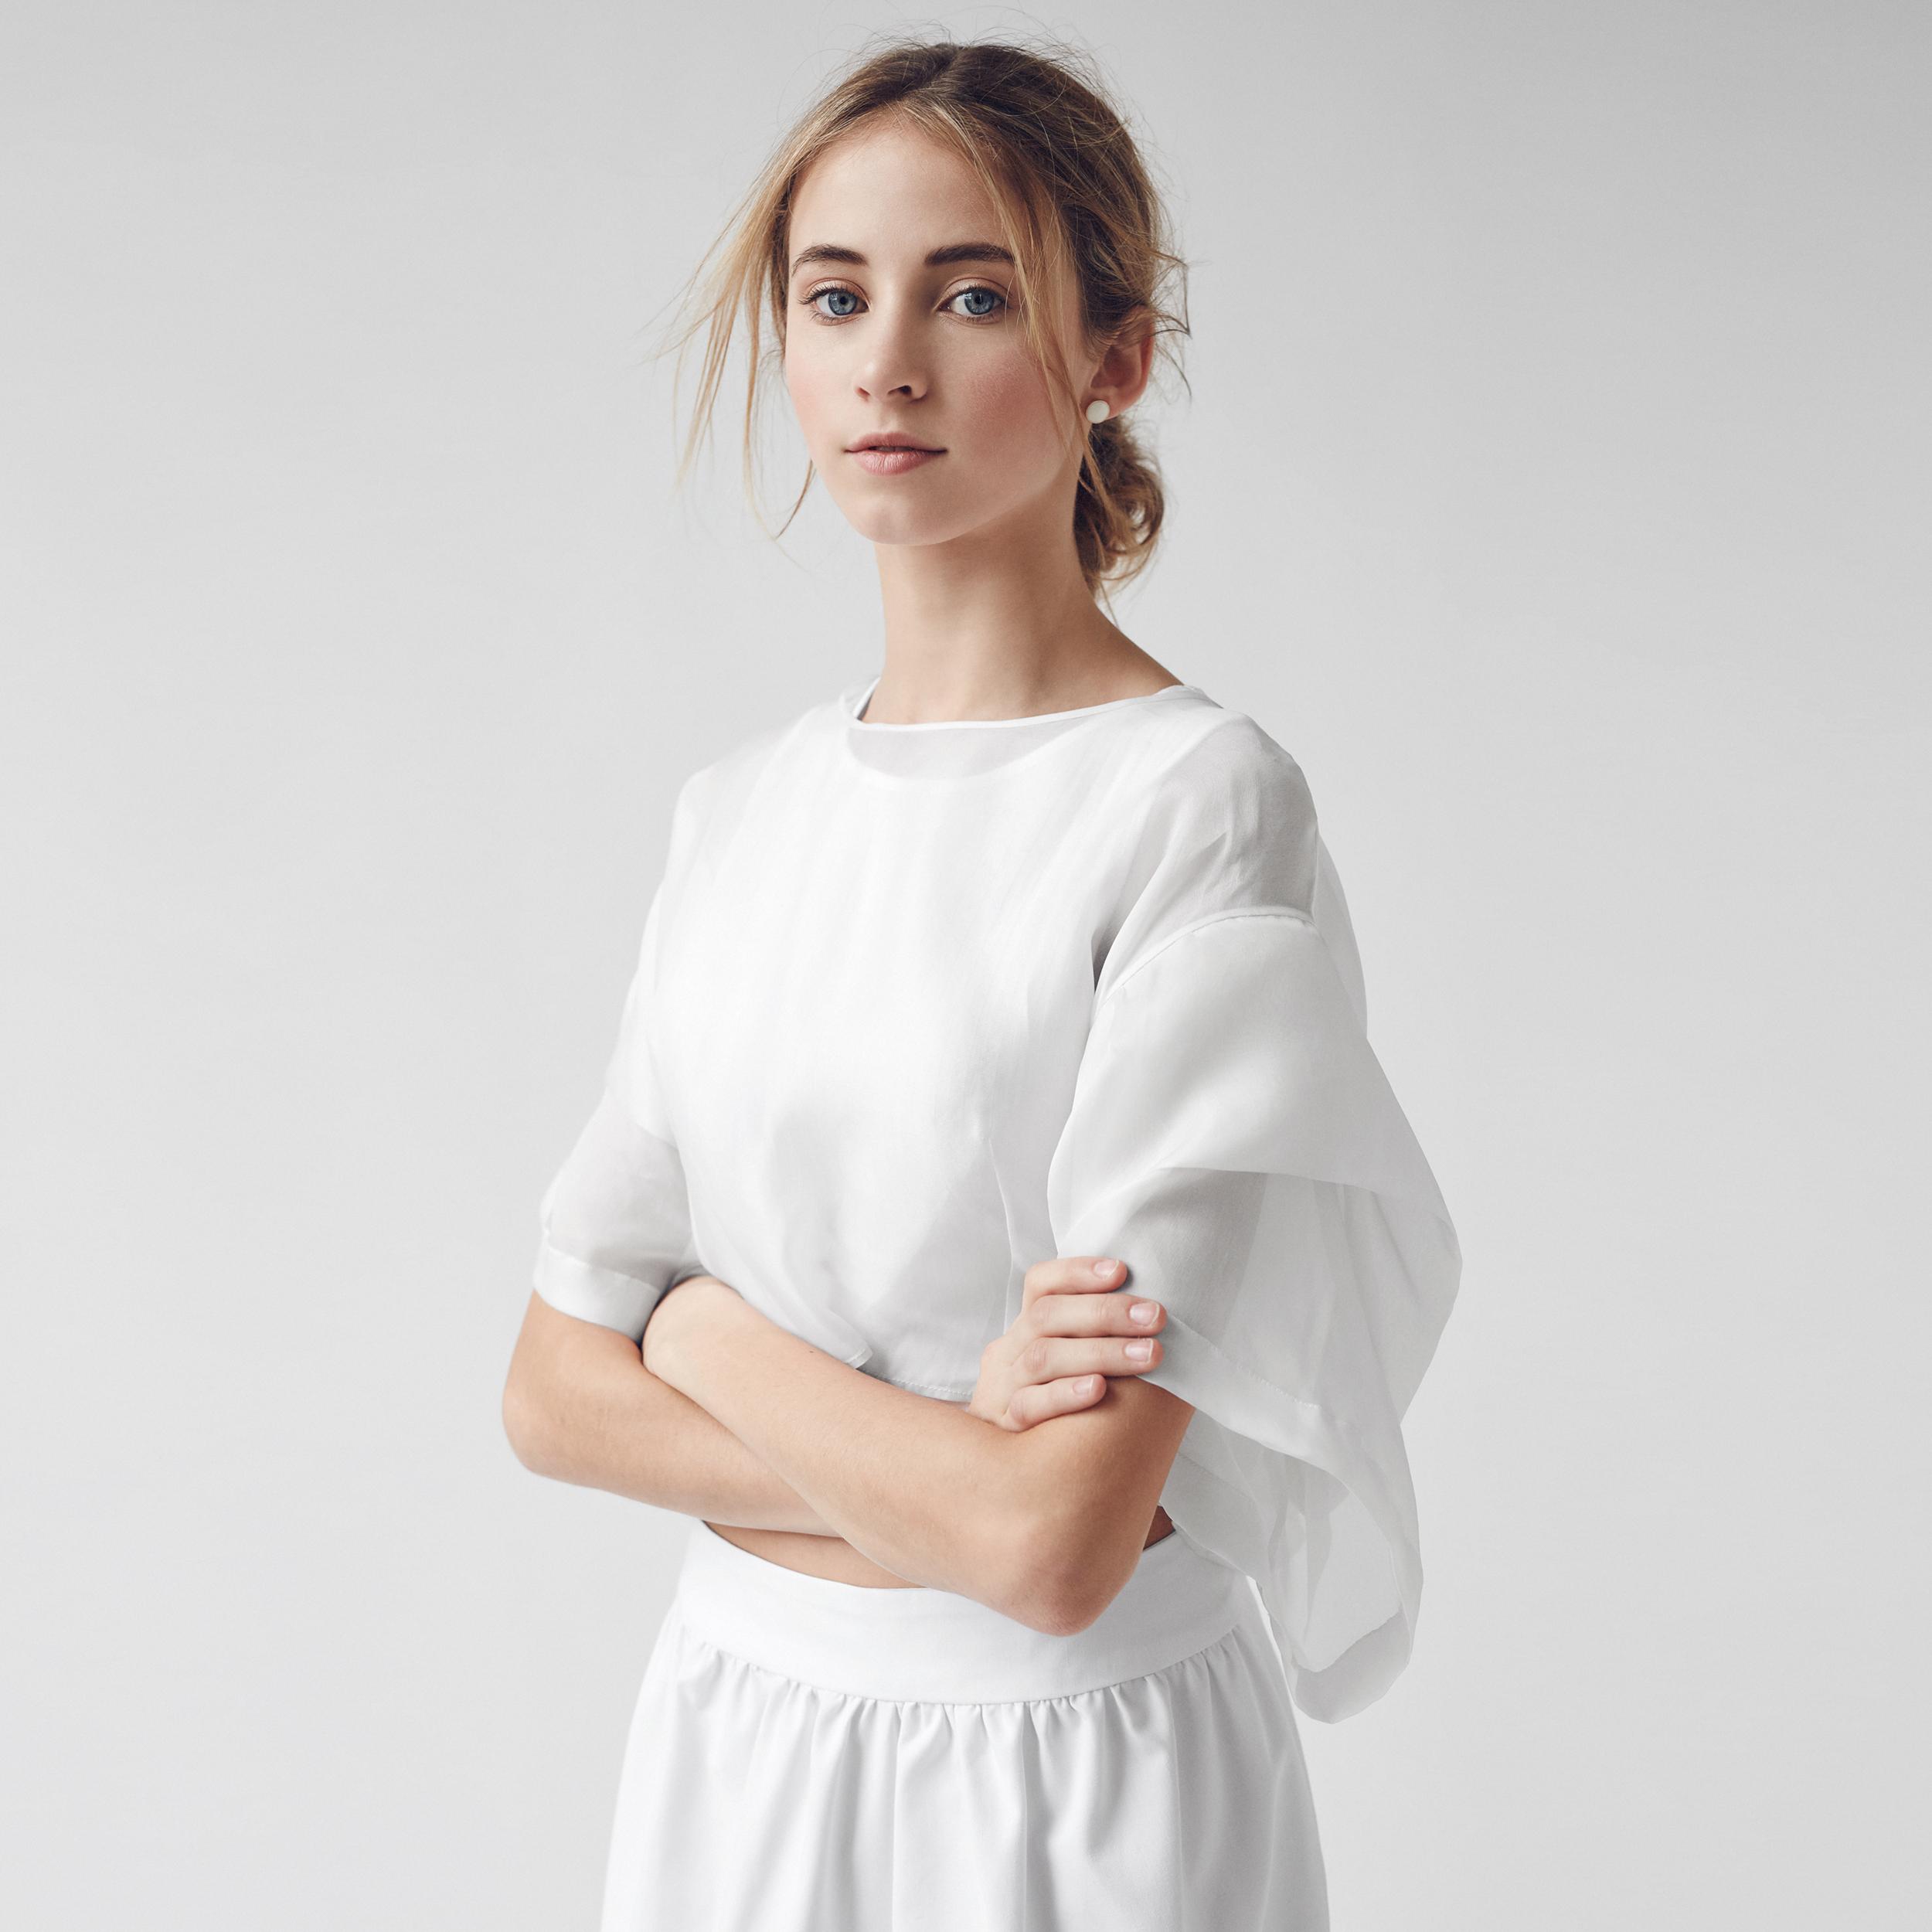 Dublin Fashion Portrait Photoshoot